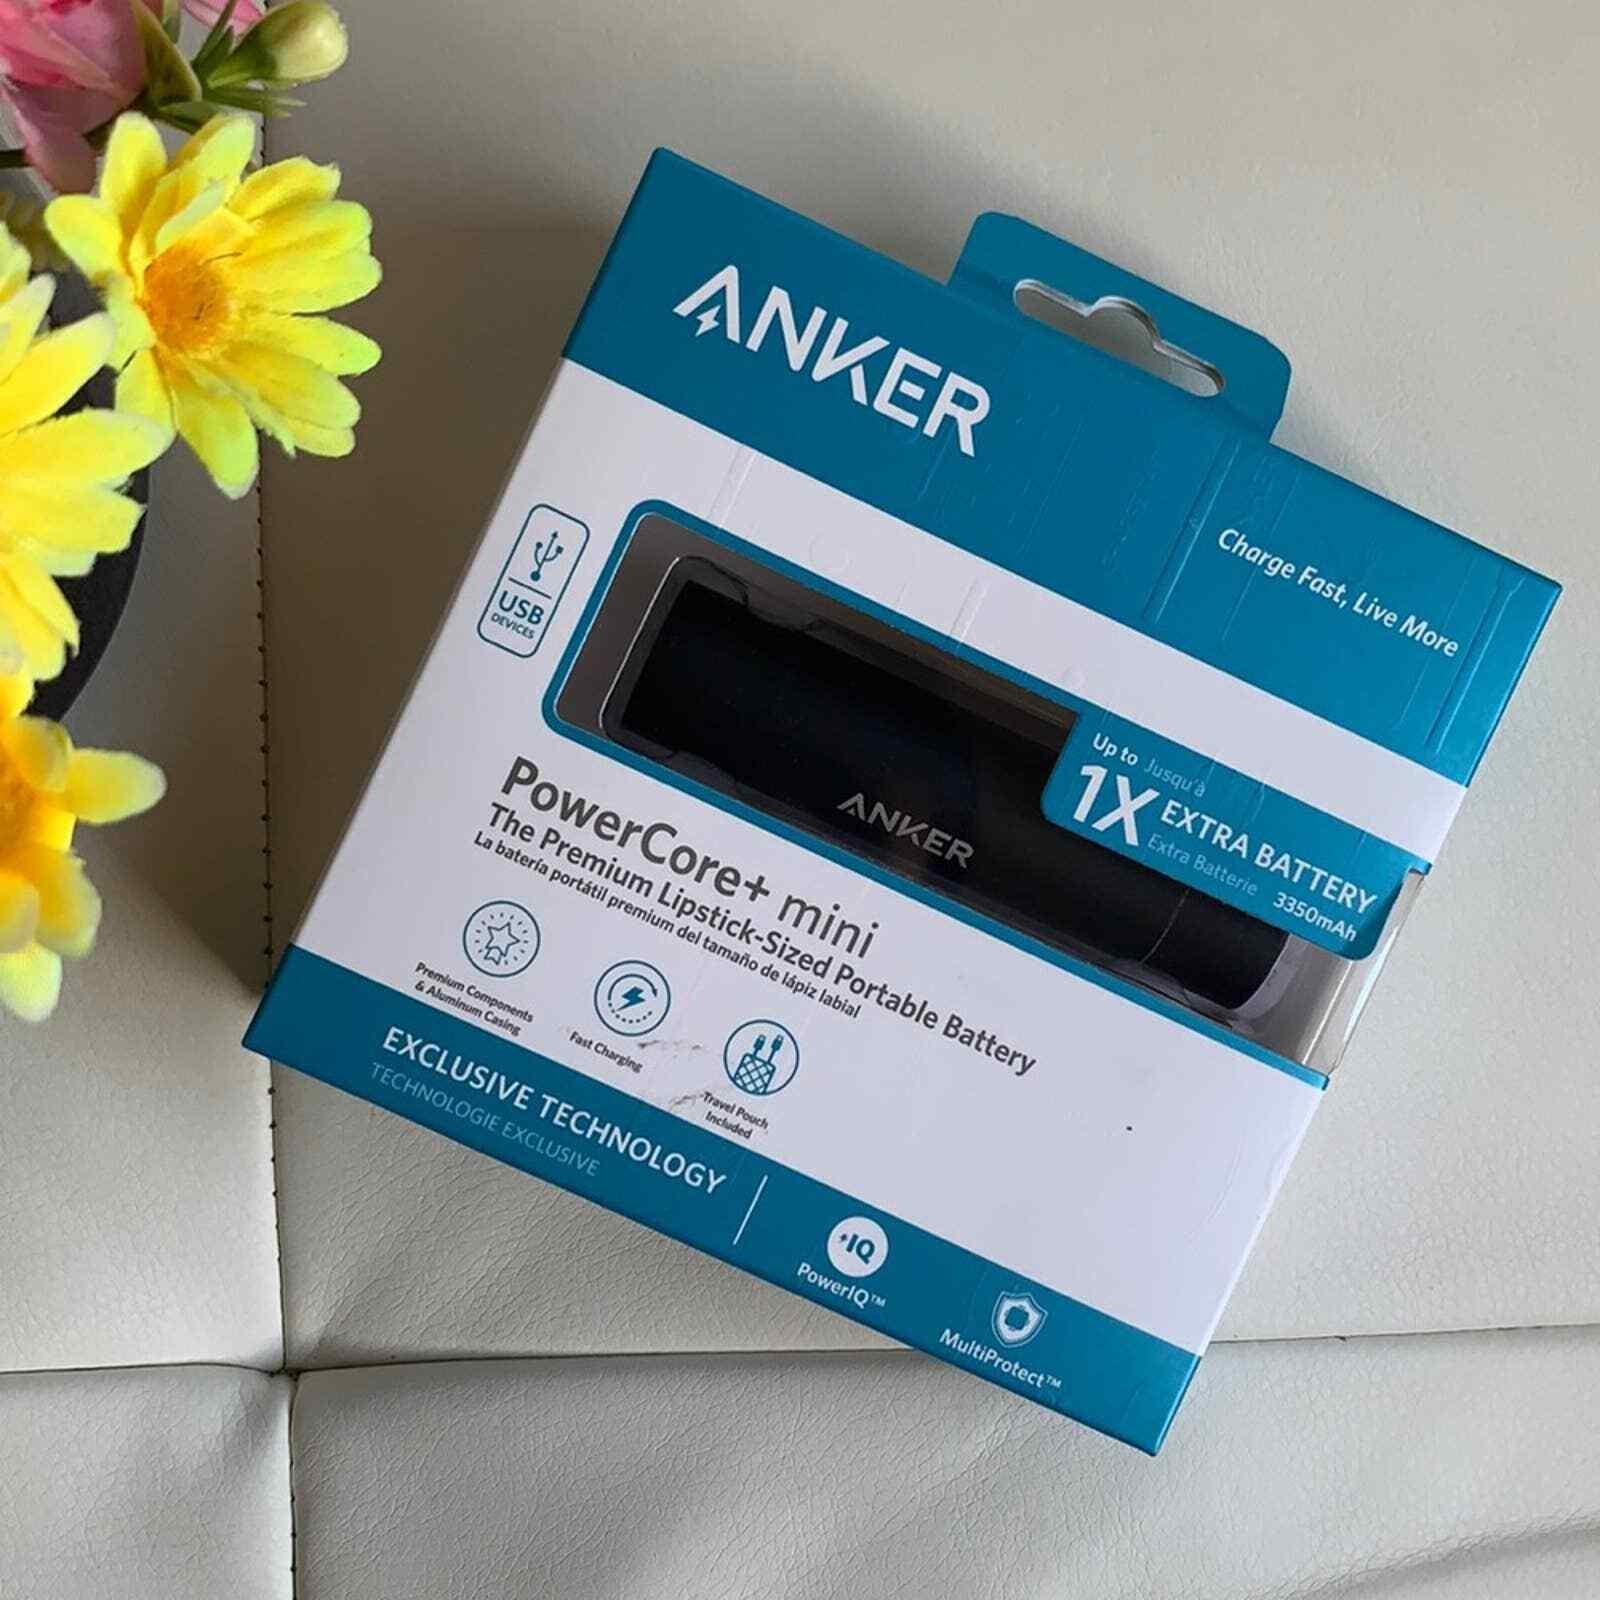 ANKER Lipstick-Sized Portable Battery Power Core+